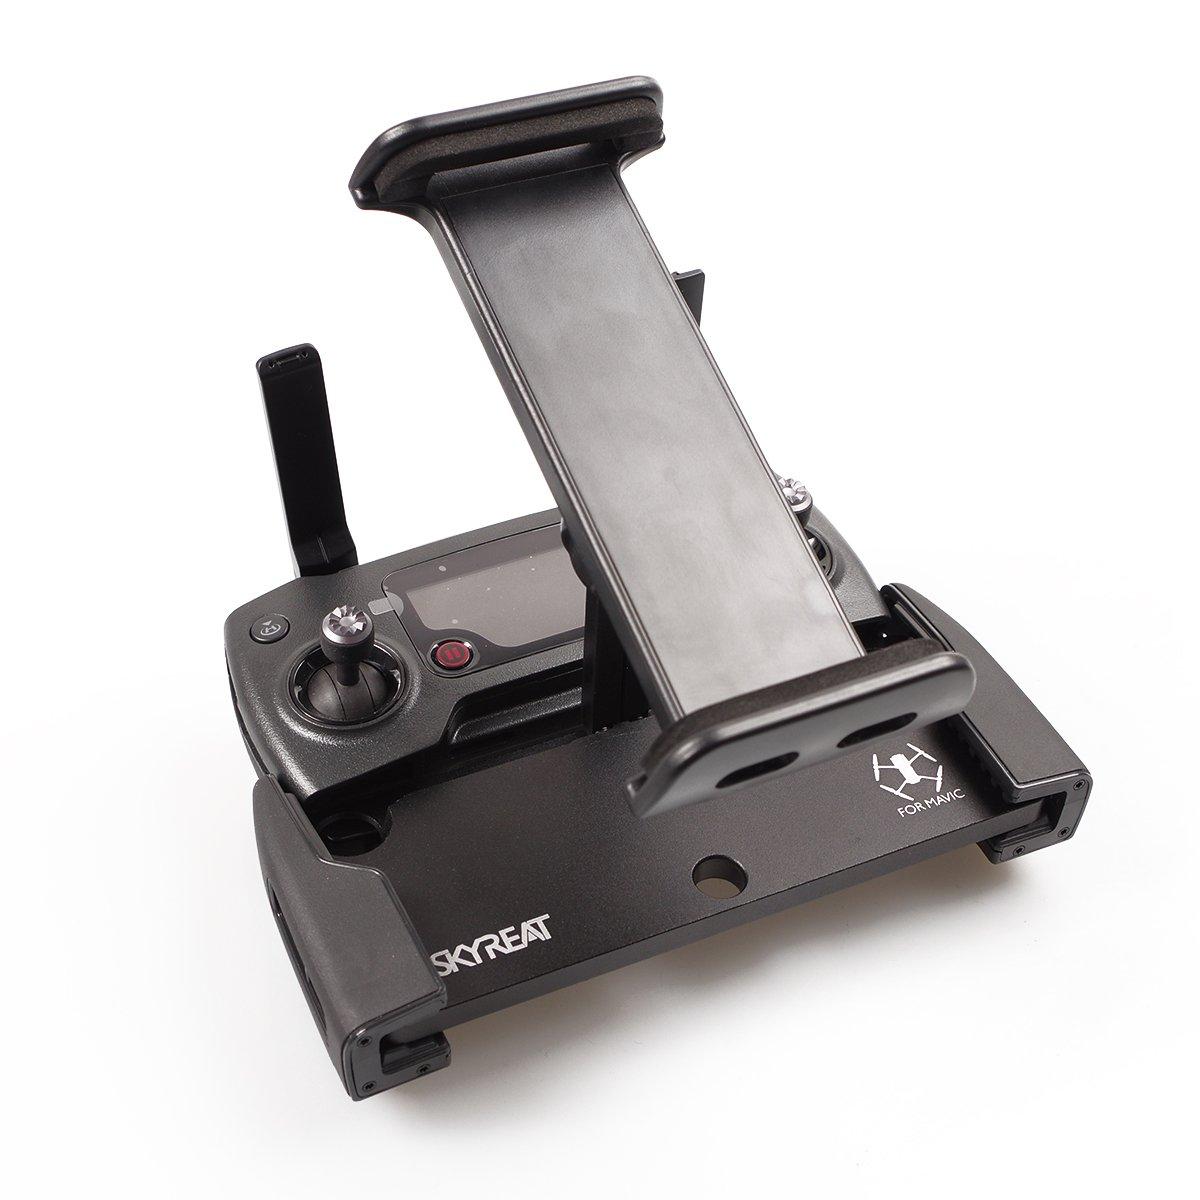 SKYREAT Mavic Air Pro Foldable Aluminum-Alloy 4-12 Inches Ipad Tablet Mount Holder for DJI Mavic 2 Pro ,Mavic 2 Zoom / Mavic Pro / Mavic Air ,DJI Spark Accessories Remote Controller